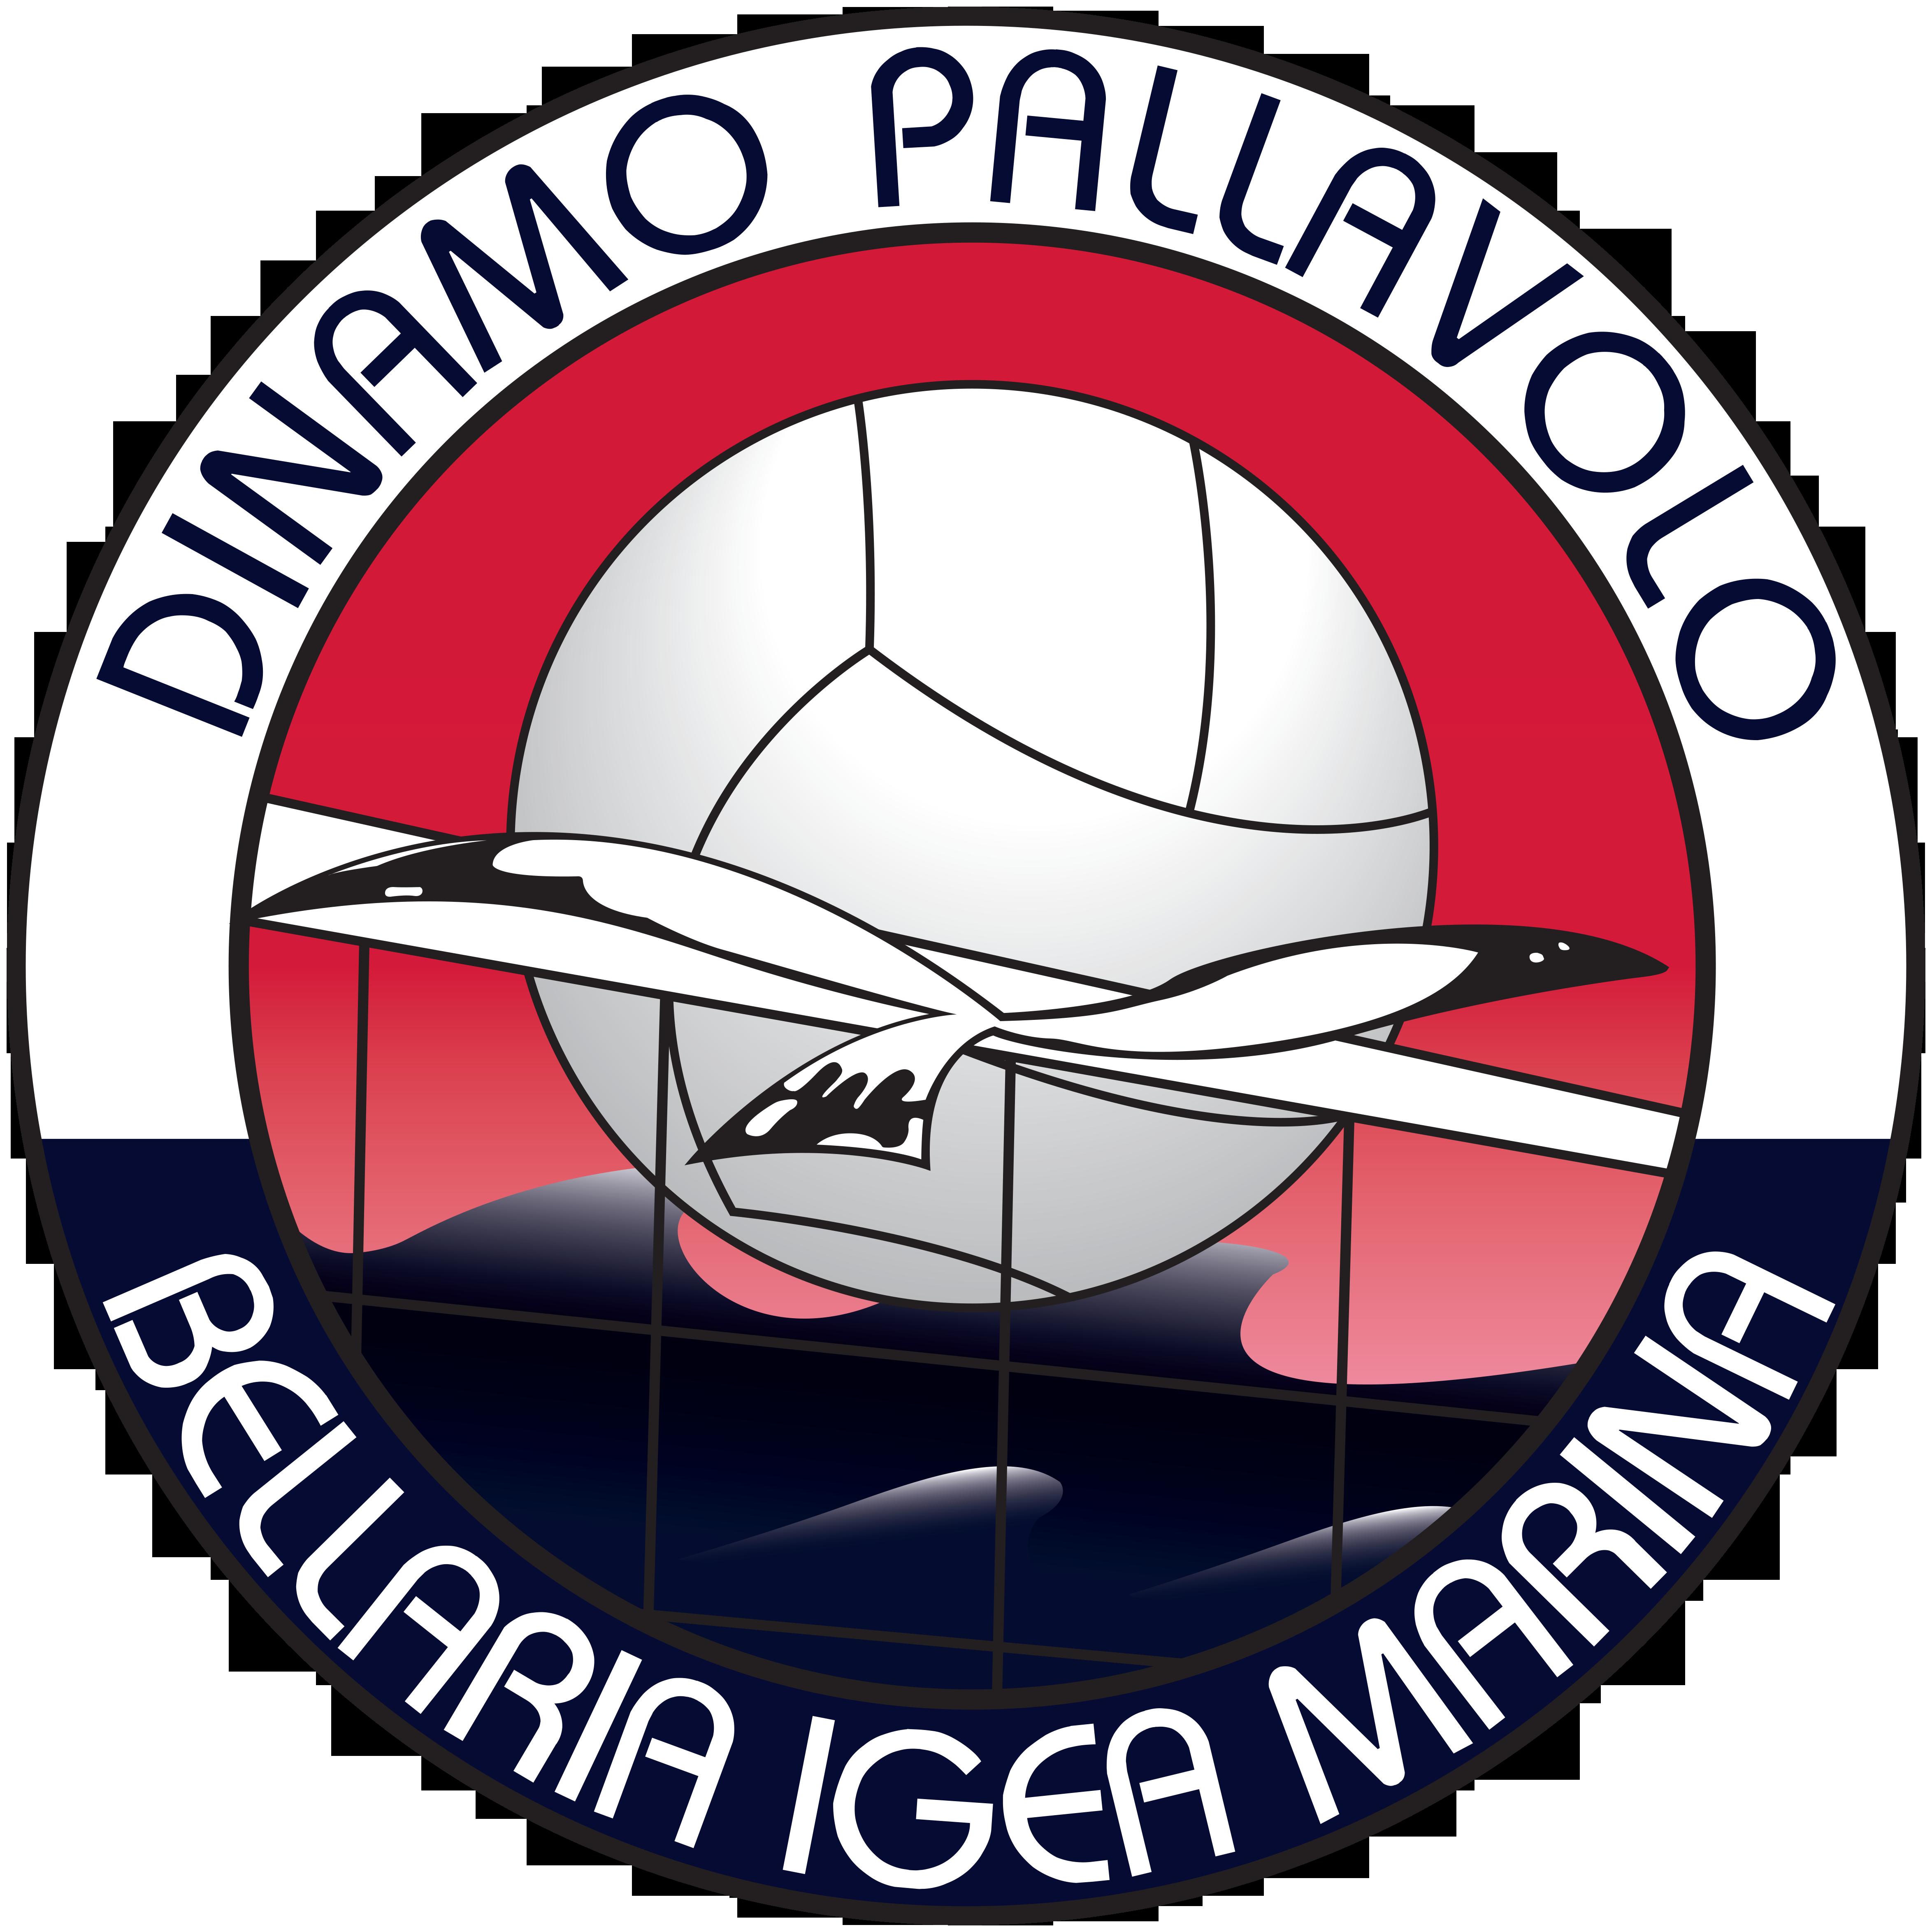 Logo Dinamo Pallavolo (OK) VETT